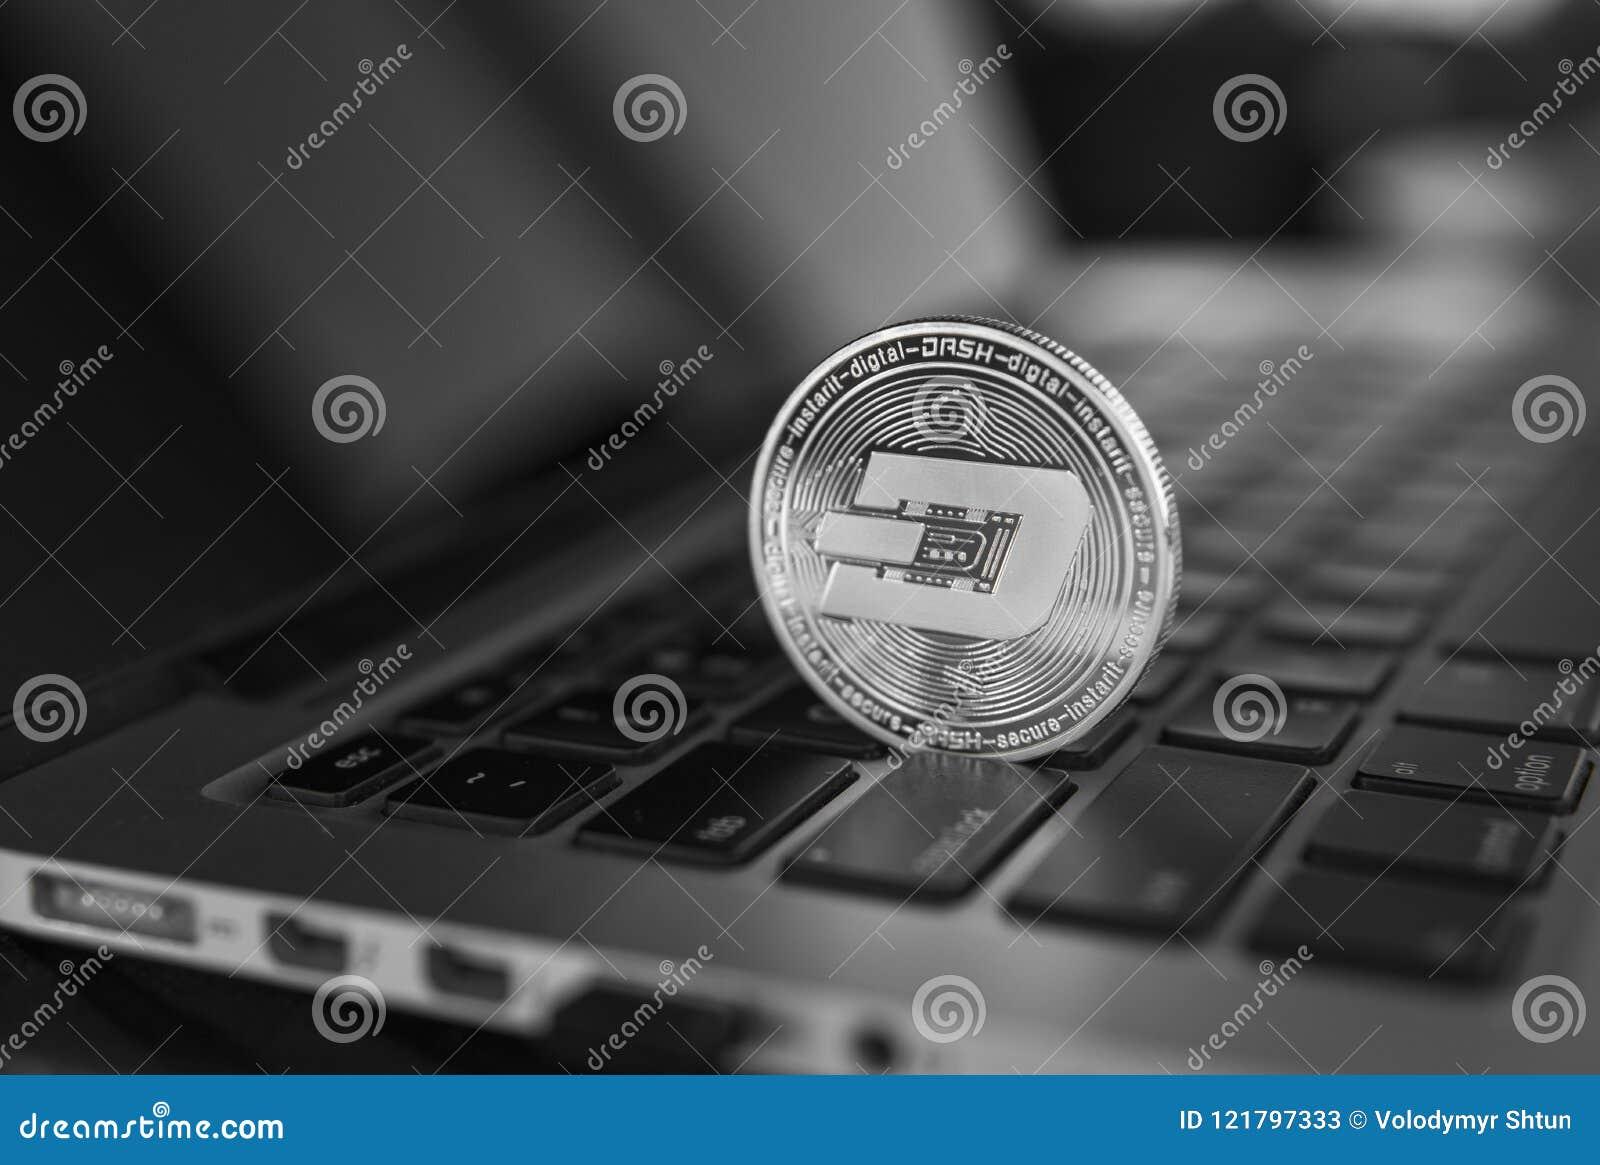 Dash Coin Mining